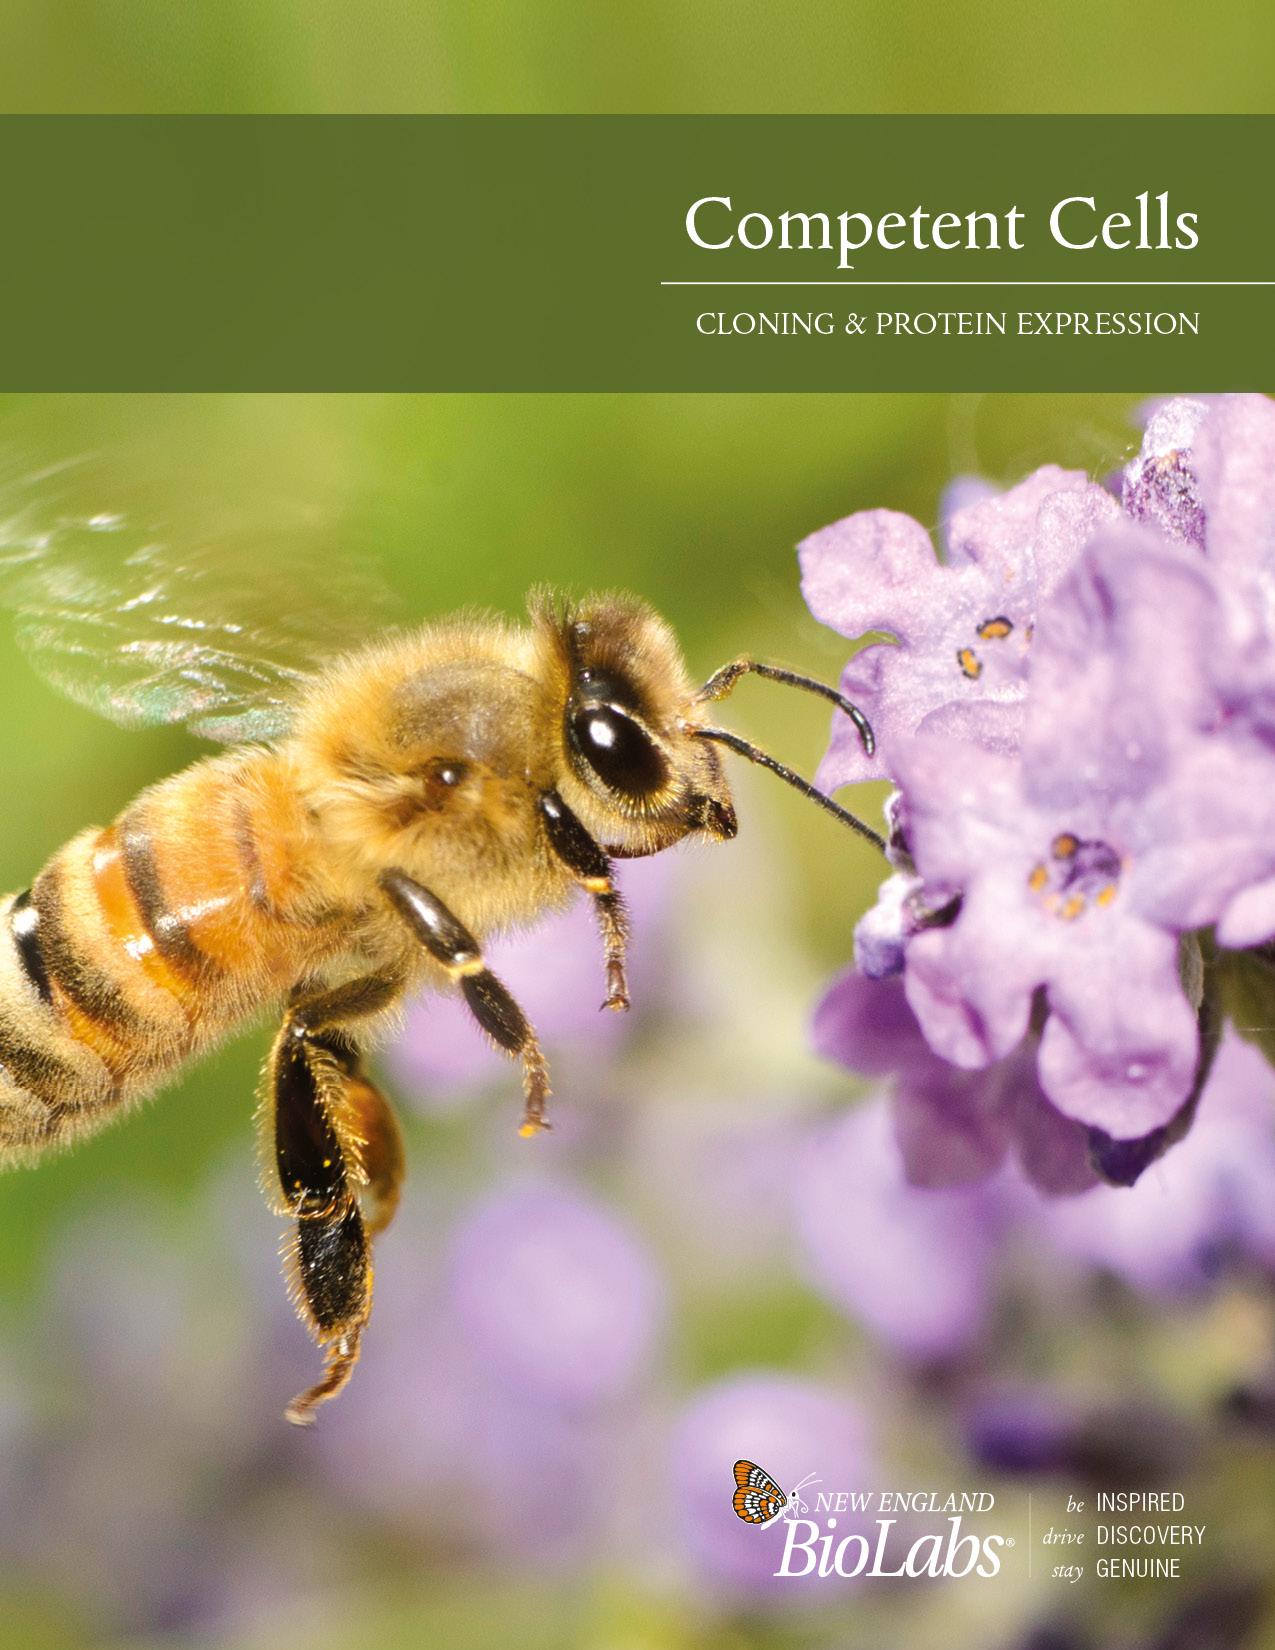 Kompetente Zellen Broschüre